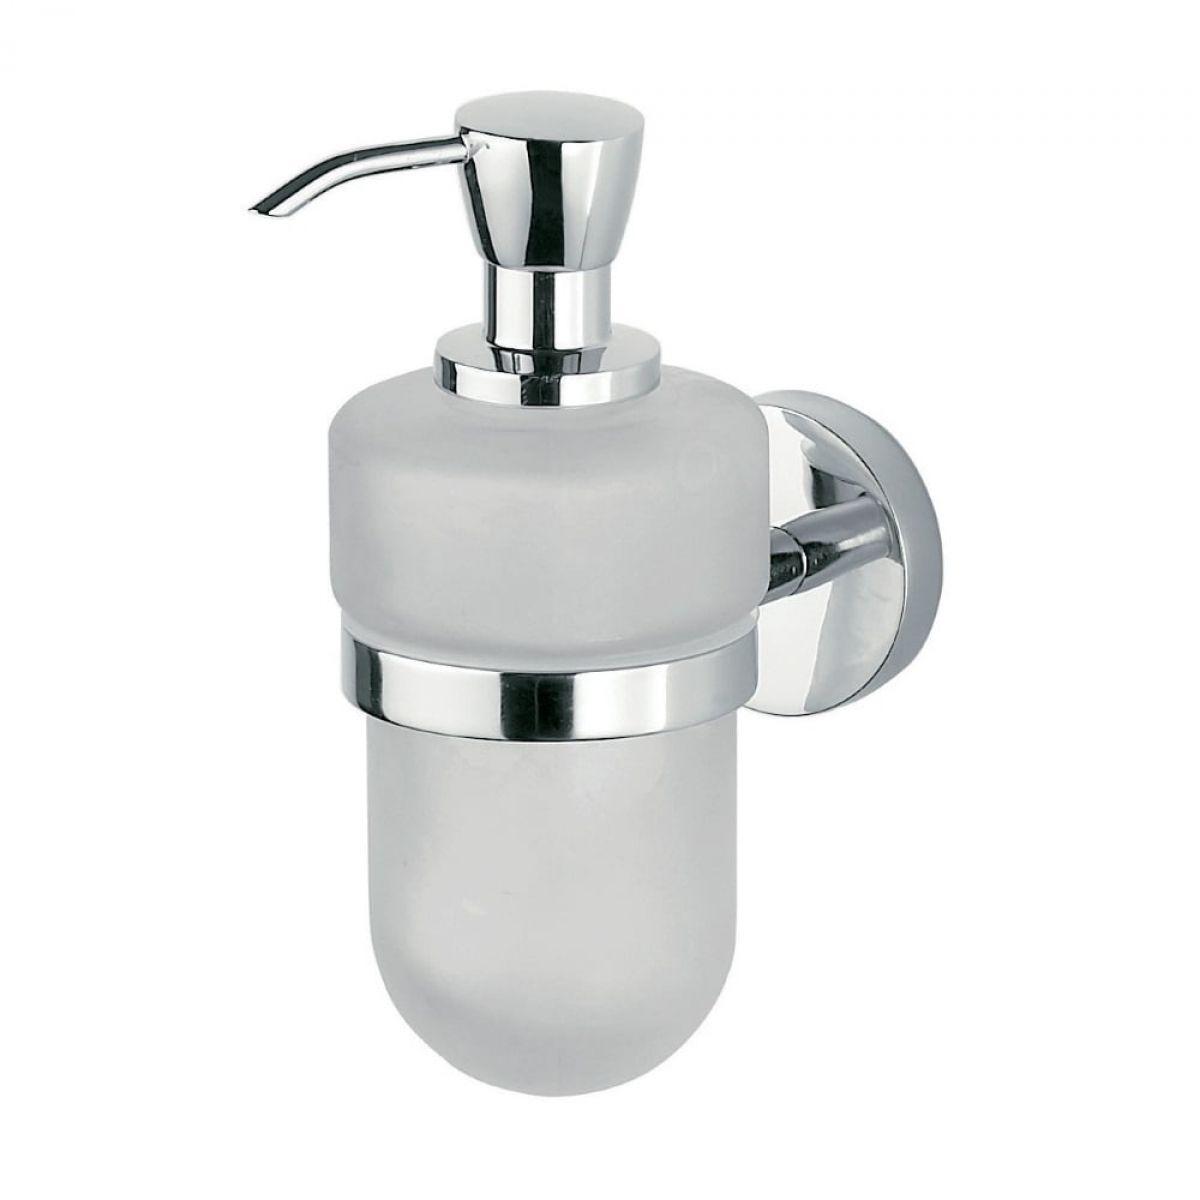 Wall Mounted Dispenser ~ Inda forum wall mounted liquid soap dispenser h